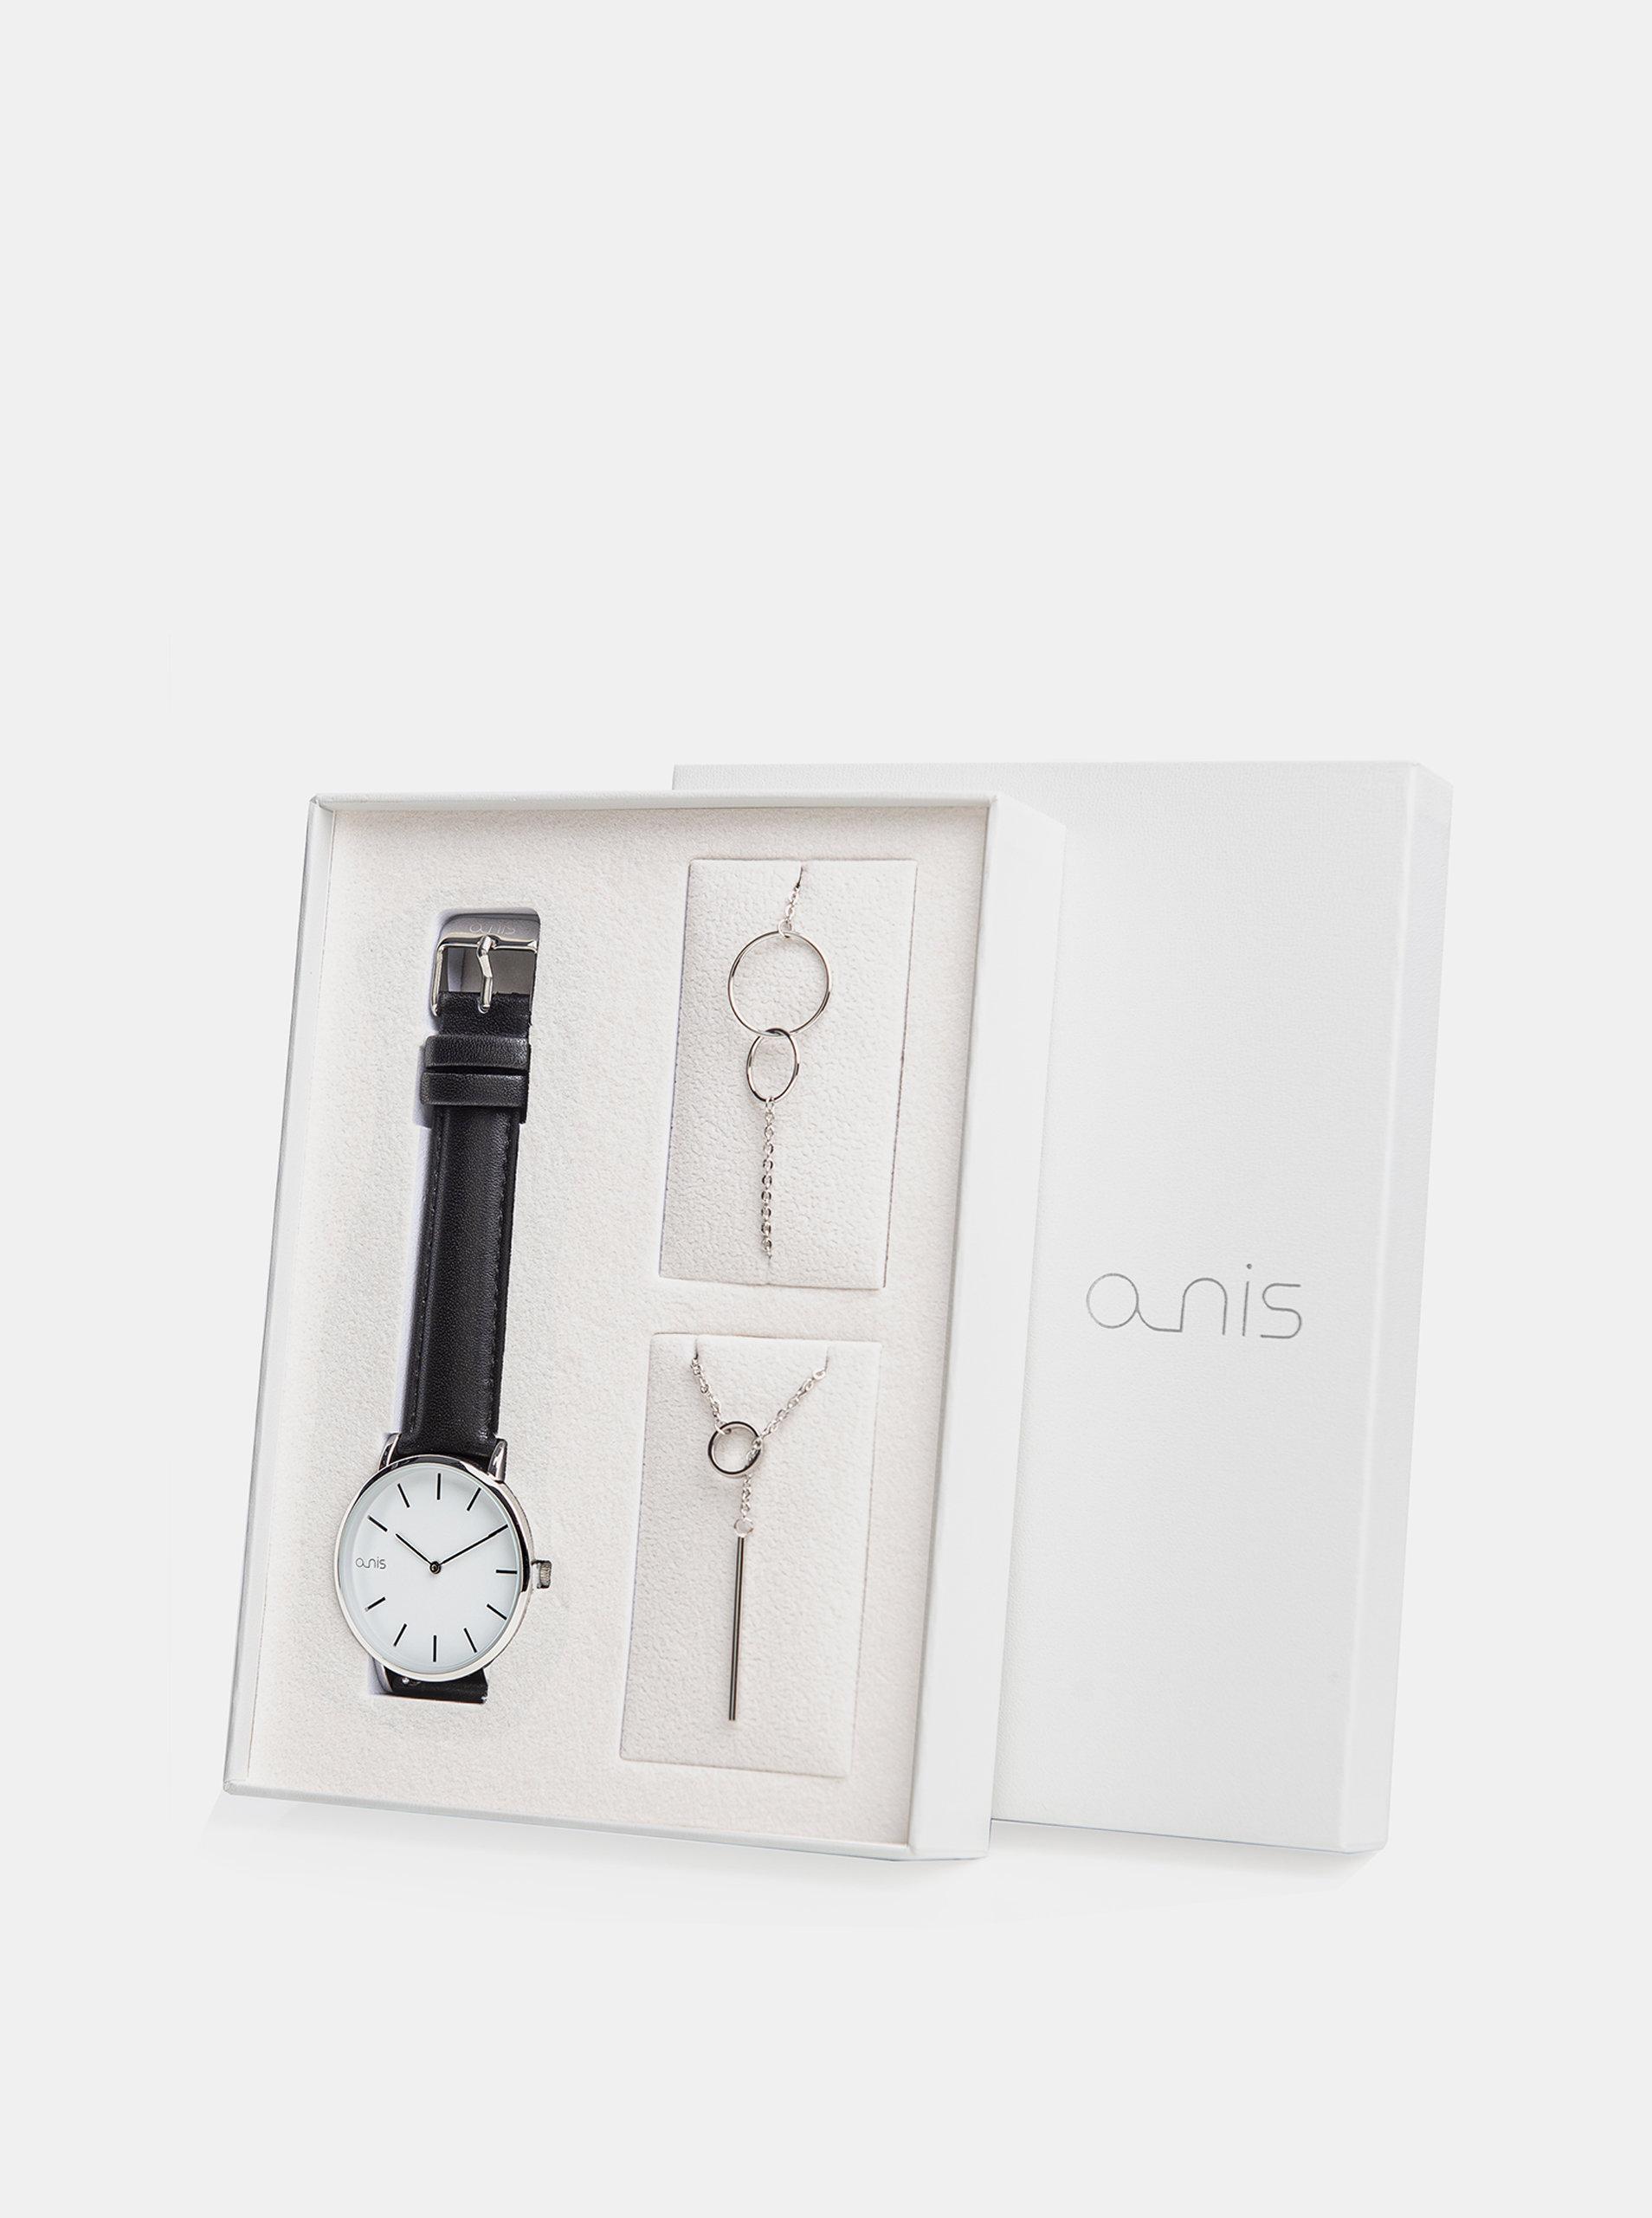 Sada dámského náramku, náhrdelníku a hodinek s černým koženým páskem a-nis